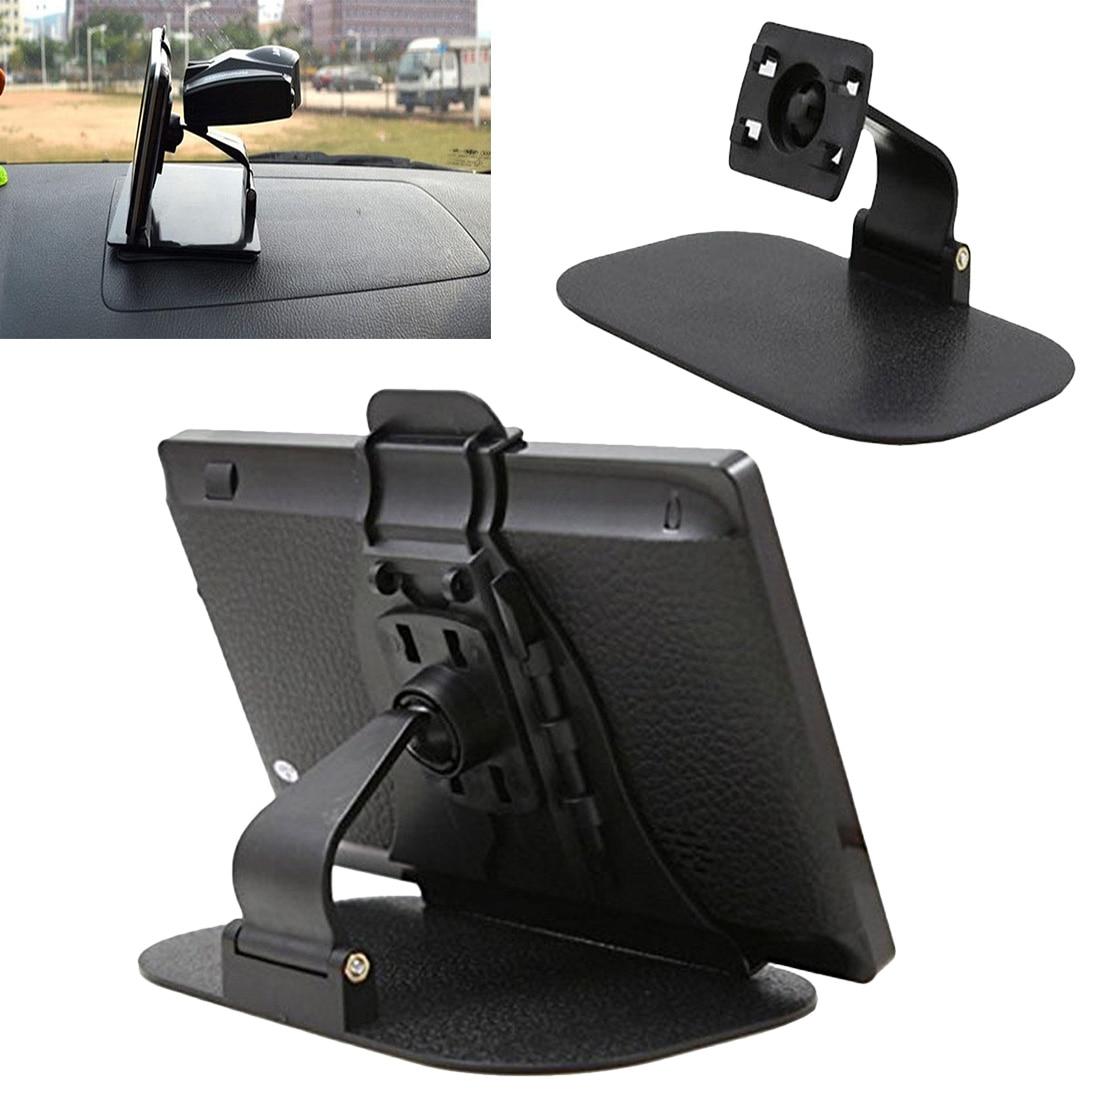 7 Inch Universal Car Mount Bracket Stand Holder For GPS Navigation Phonecradle PC Phone Holder Tablets Silicone